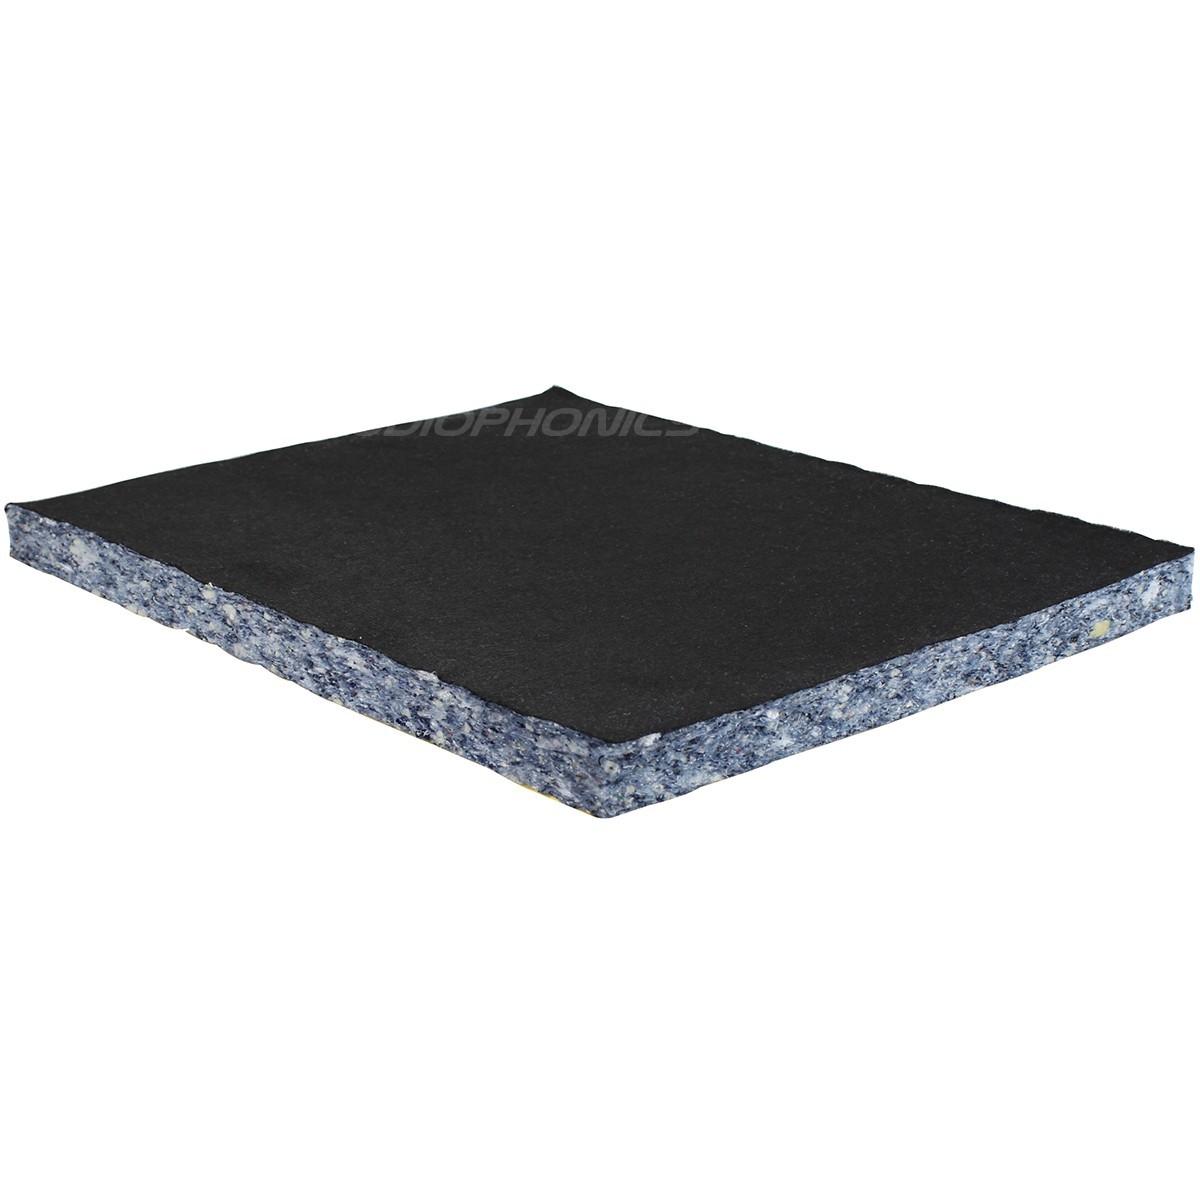 PINTA RESOBSON FE1830 Adhesive Damping Fabric 400x500mm